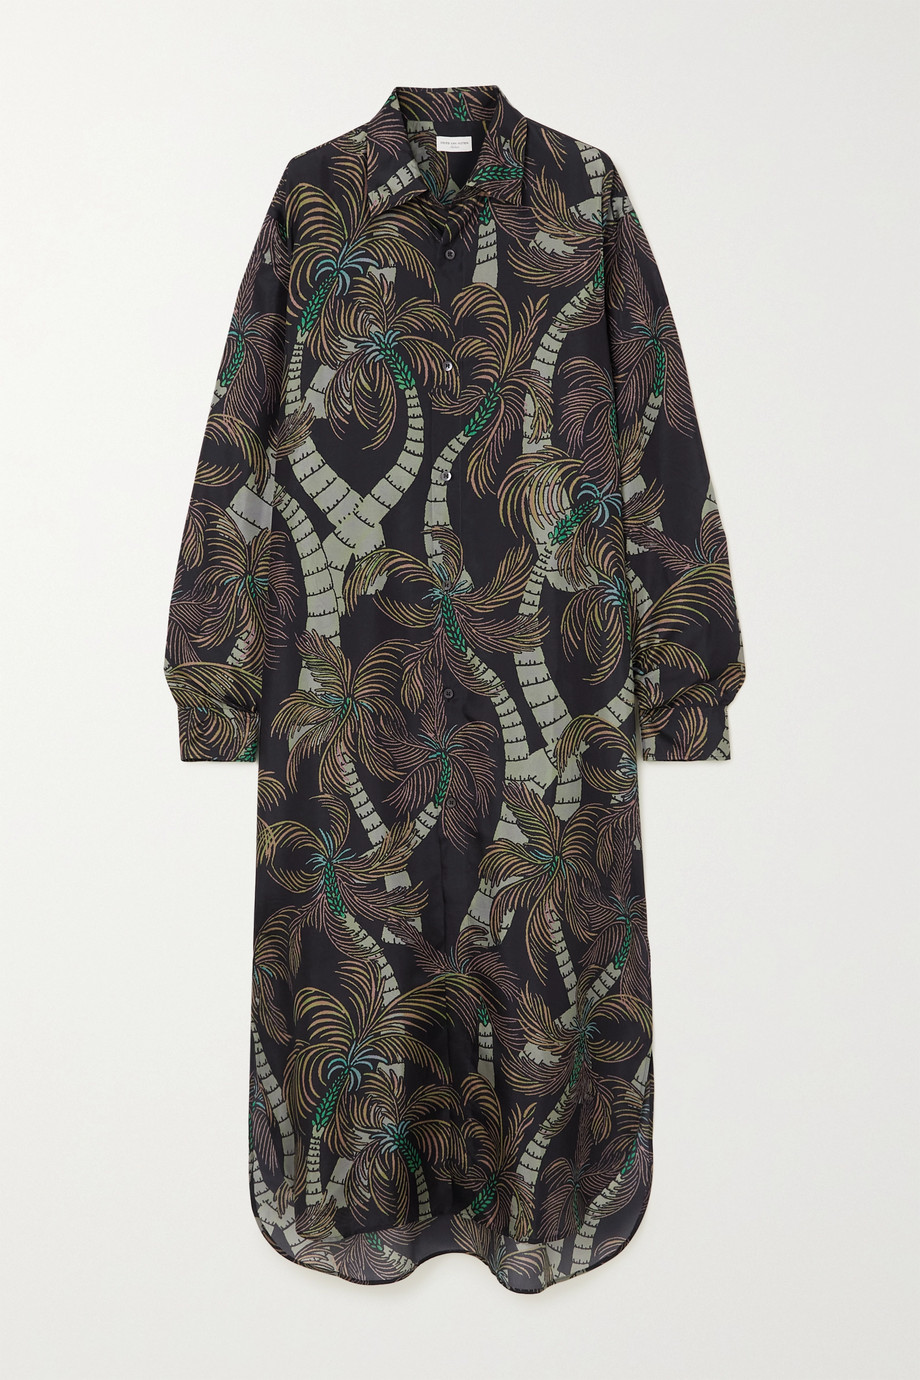 Dries Van Noten Cayley printed silk crepe de chine maxi shirt dress